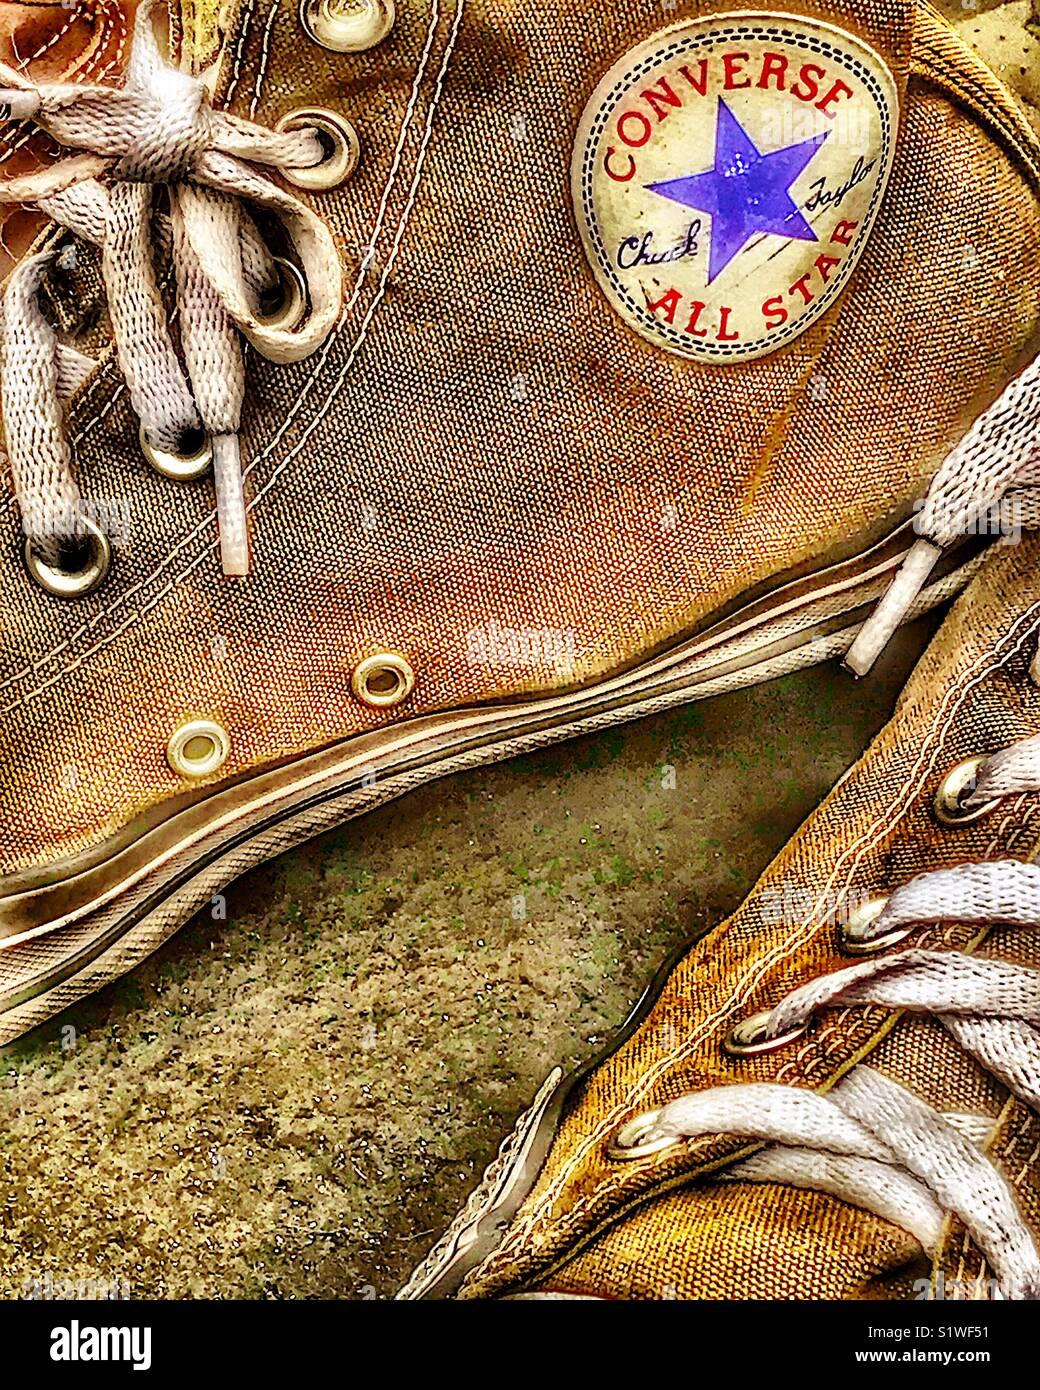 matrimonio Diariamente lápiz  Un par de zapatos tenis Converse All-Star Fotografía de stock - Alamy